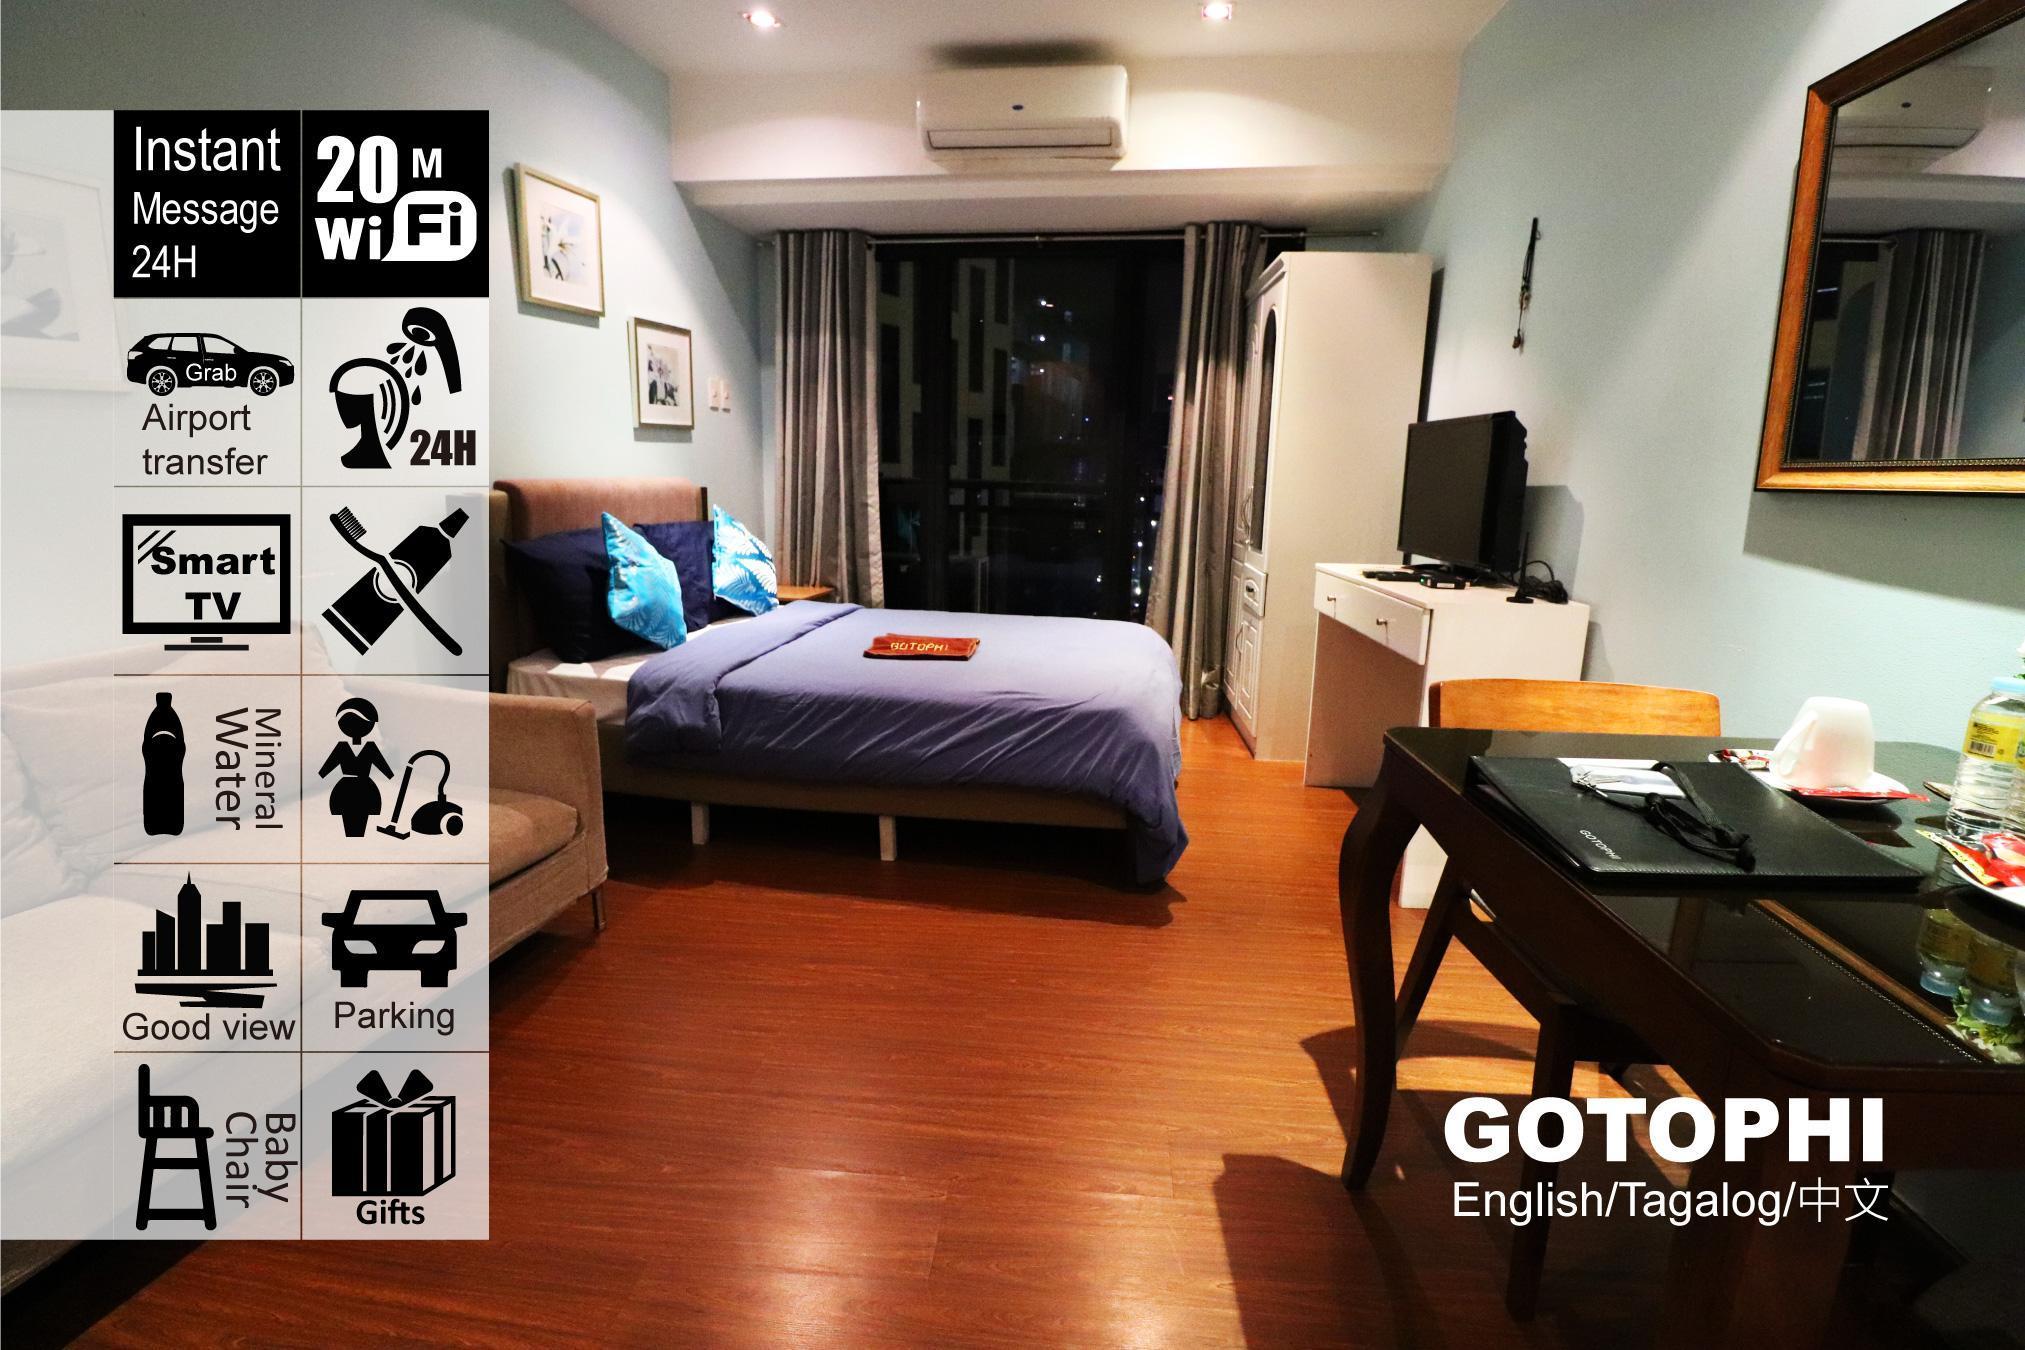 Gotophi luxurious hotel Knightsbridge Makati 3705